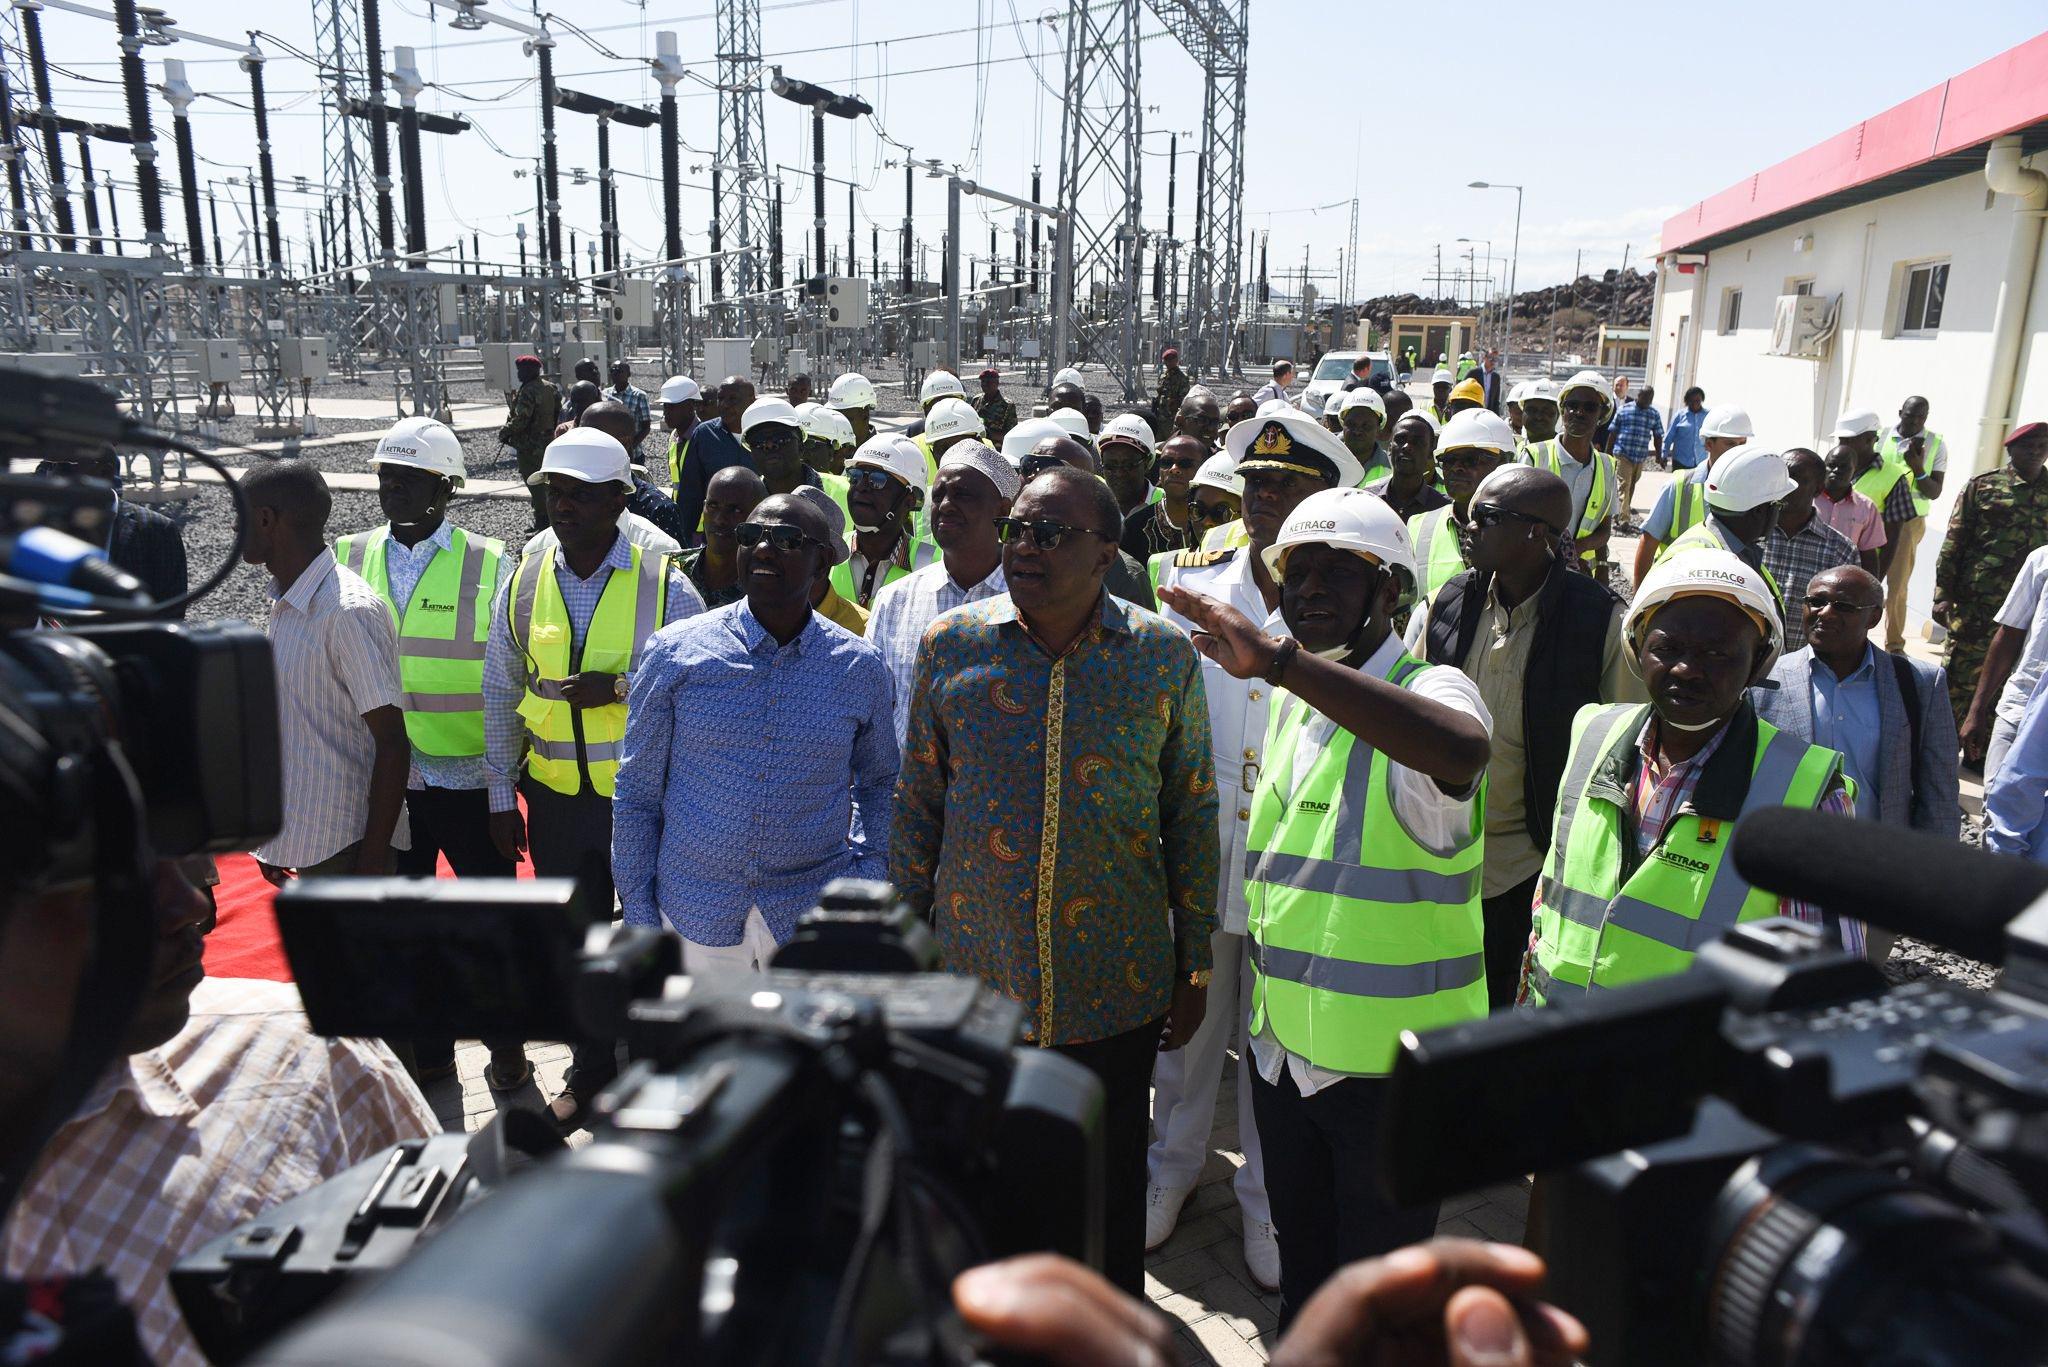 Kenyan President Uhuru Kenyatta inaugurates the 310 megawatt renewable energy project in Loiyangalani, Marsabit County, on July 19, 2019. - Some of the 365-turbines make the Lake Turkana Wind Power project, the largest of its kind in Africa. LEHTIKUVA / AFP  Nick Perry